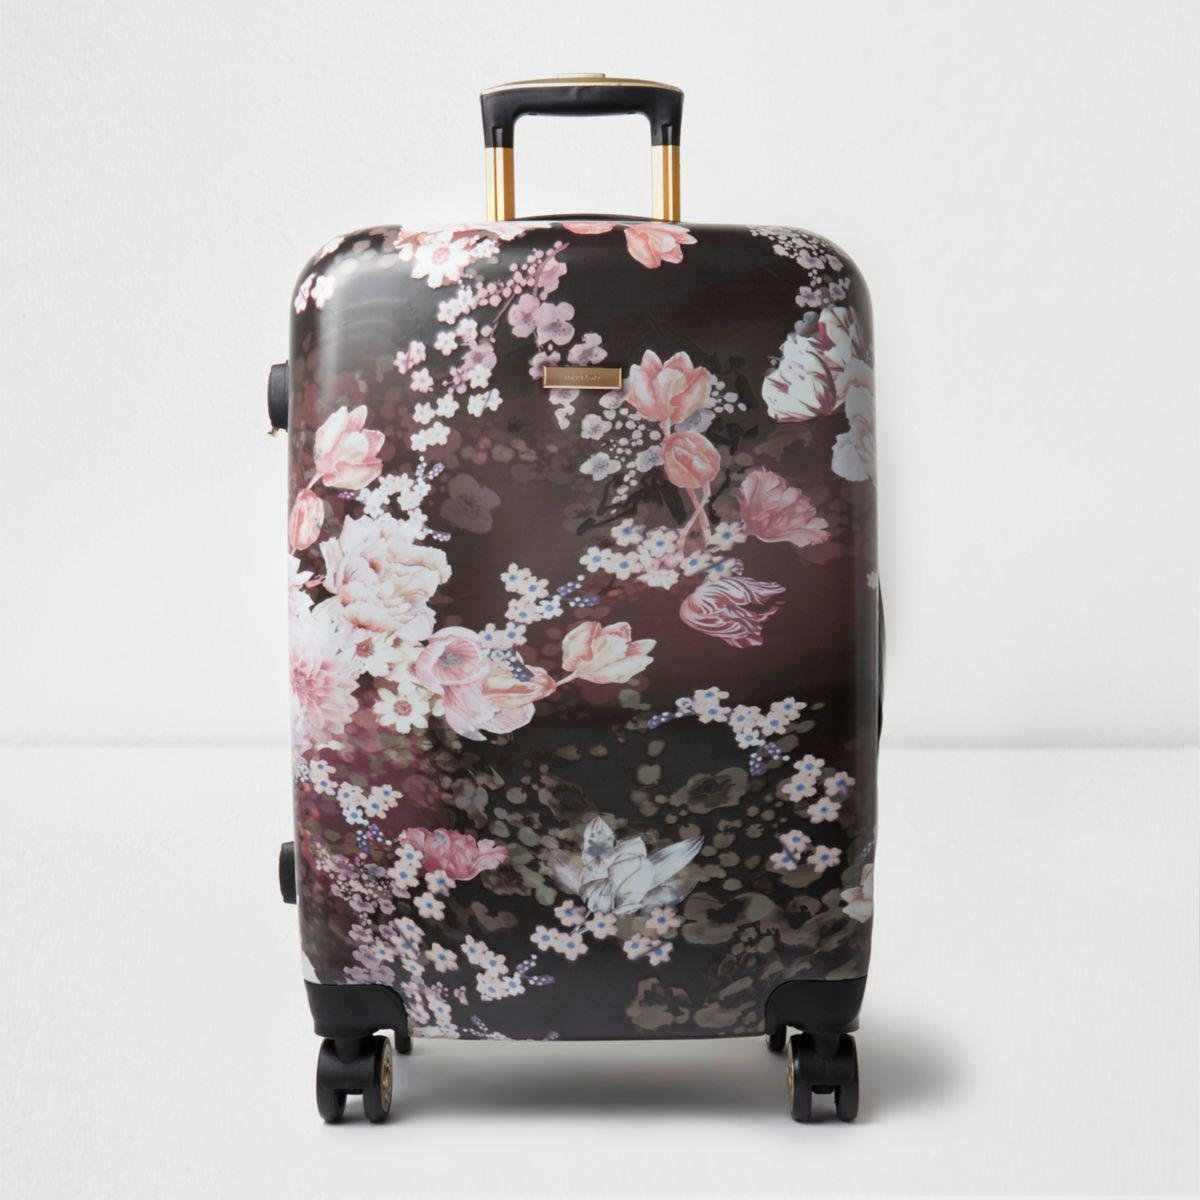 River Island Hand Luggage